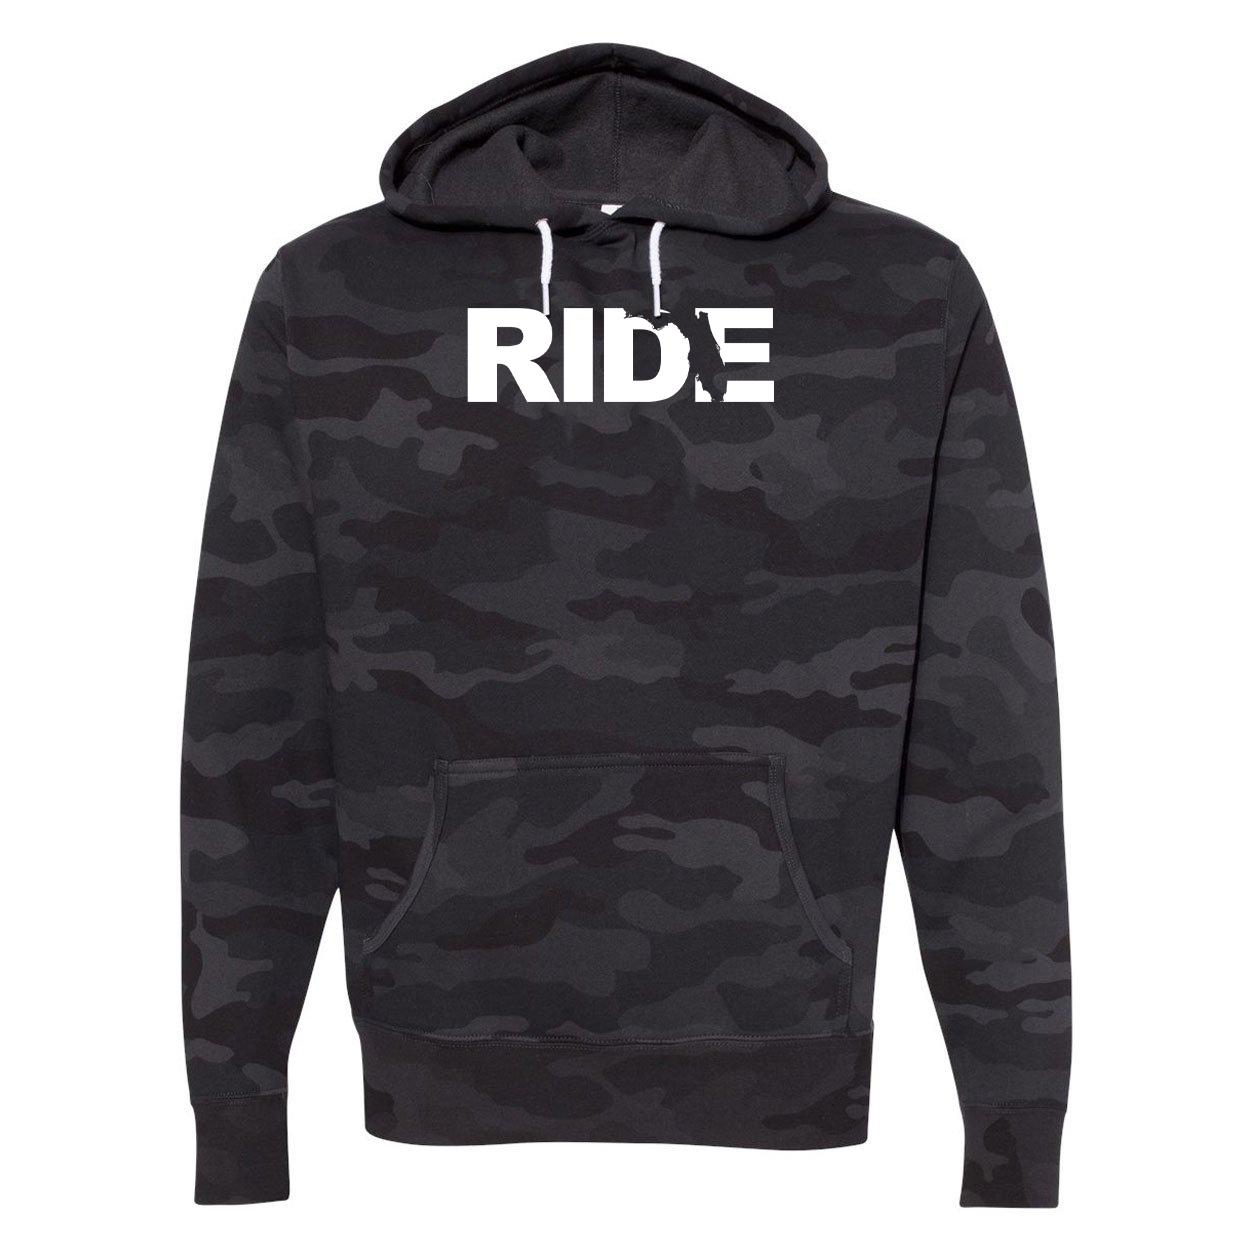 Ride Florida Classic Unisex Hooded Sweatshirt Black Camo (White Logo)